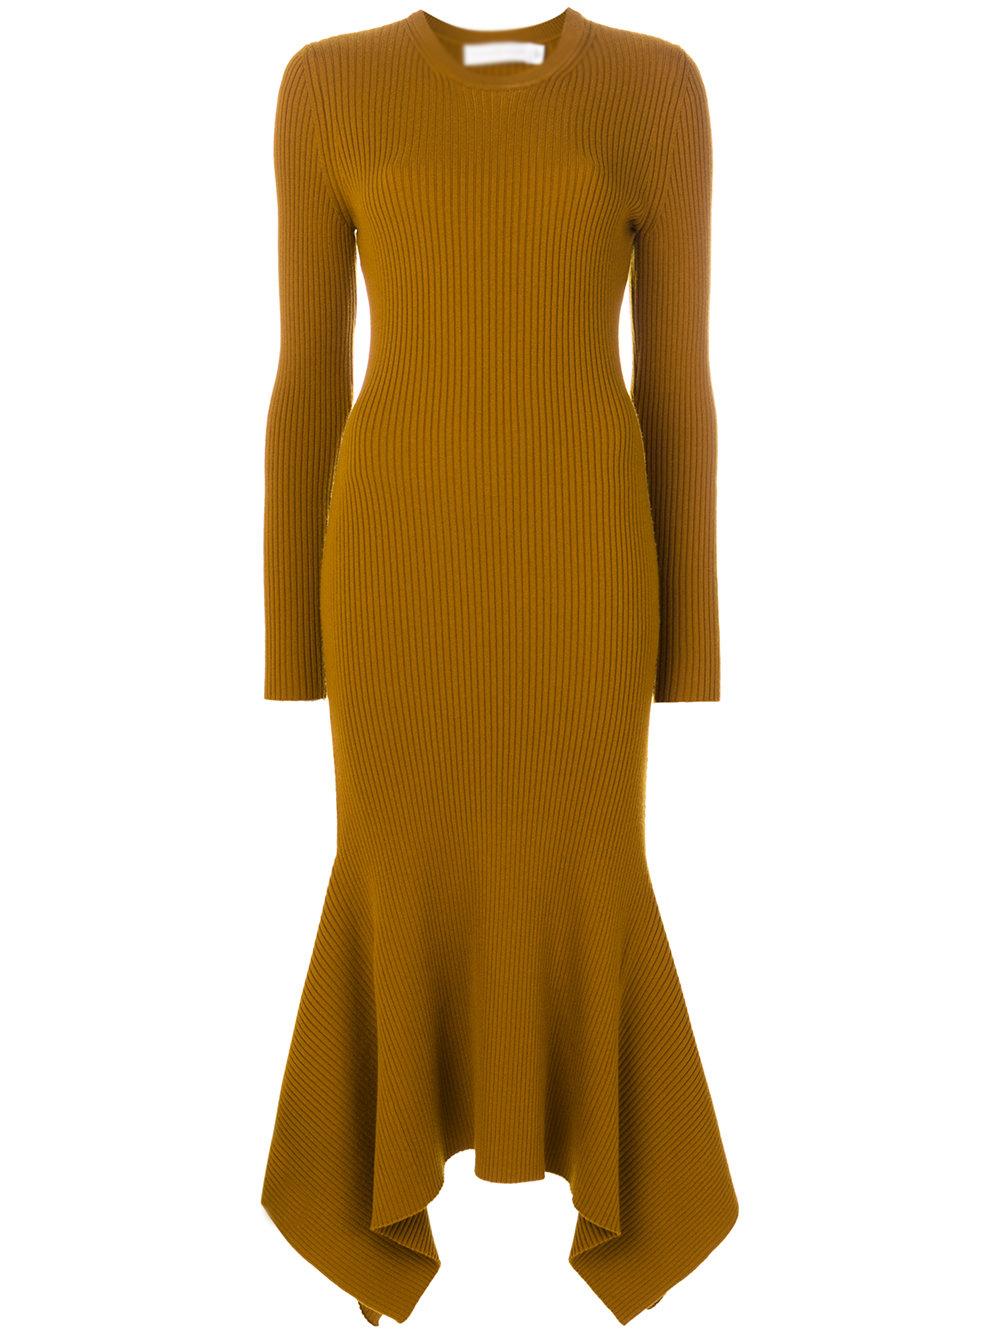 Dongguan Clothing Factory Yellow Tight Wool Draped Hem Ribbed ...